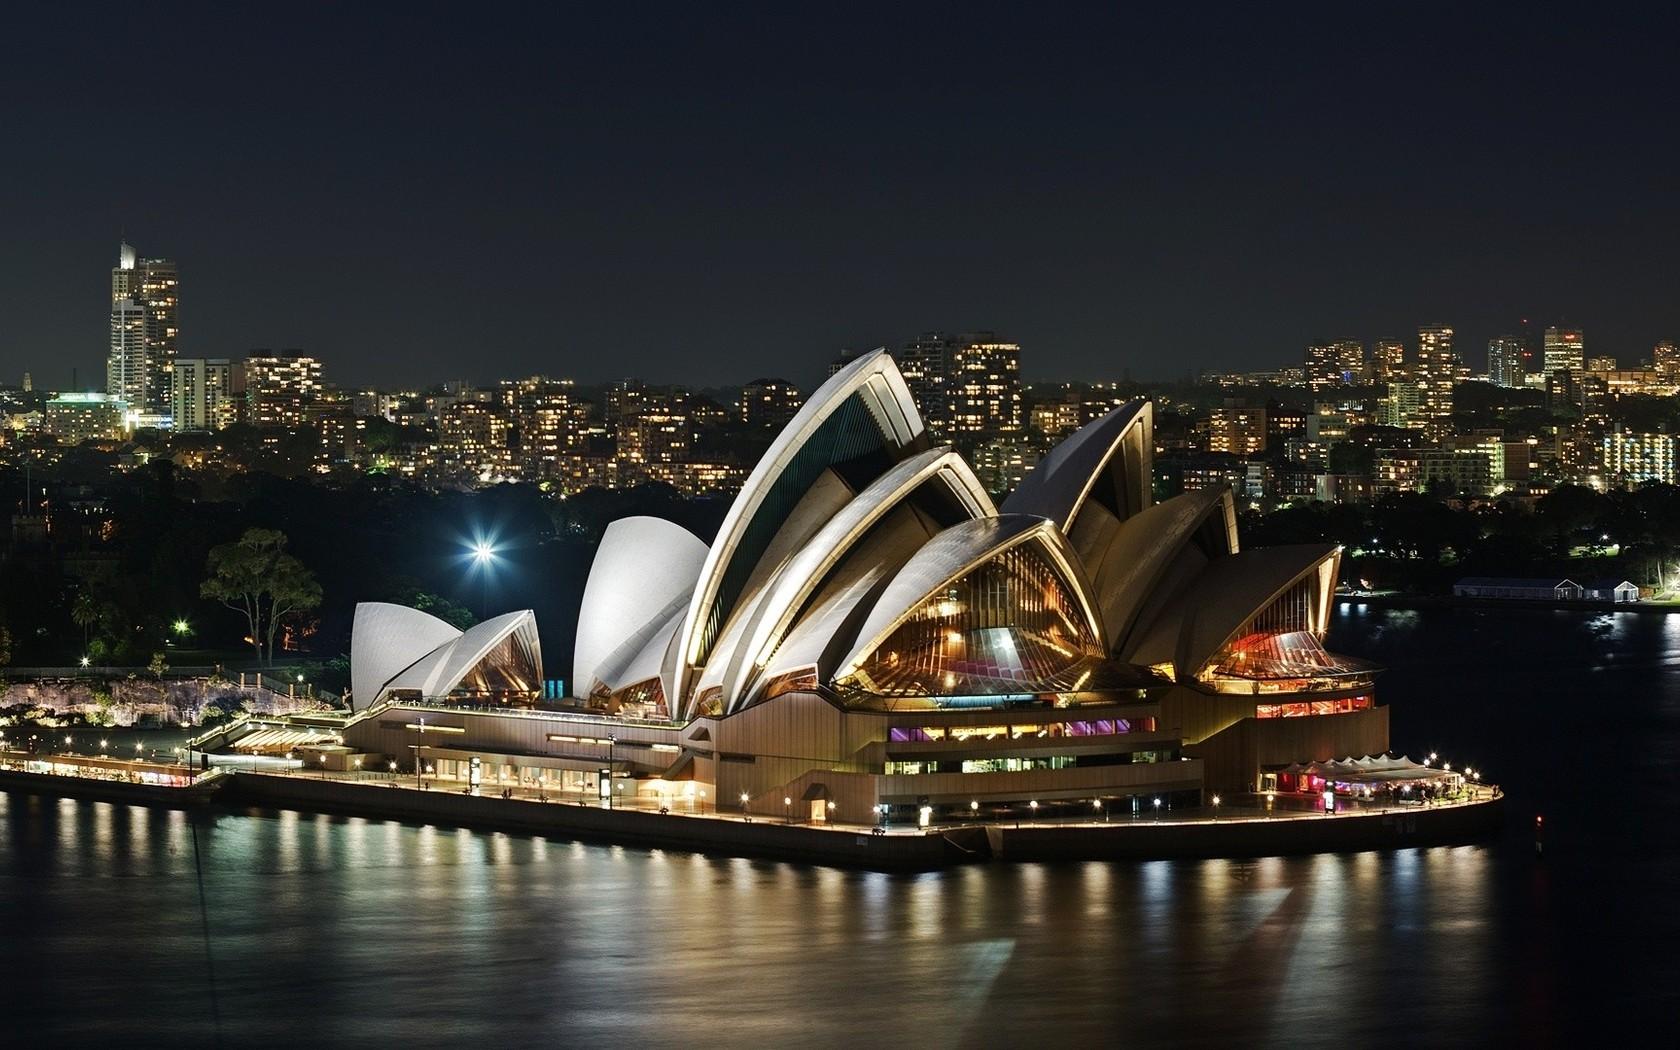 Sydney Opera House wallpaper 4237 1680x1050